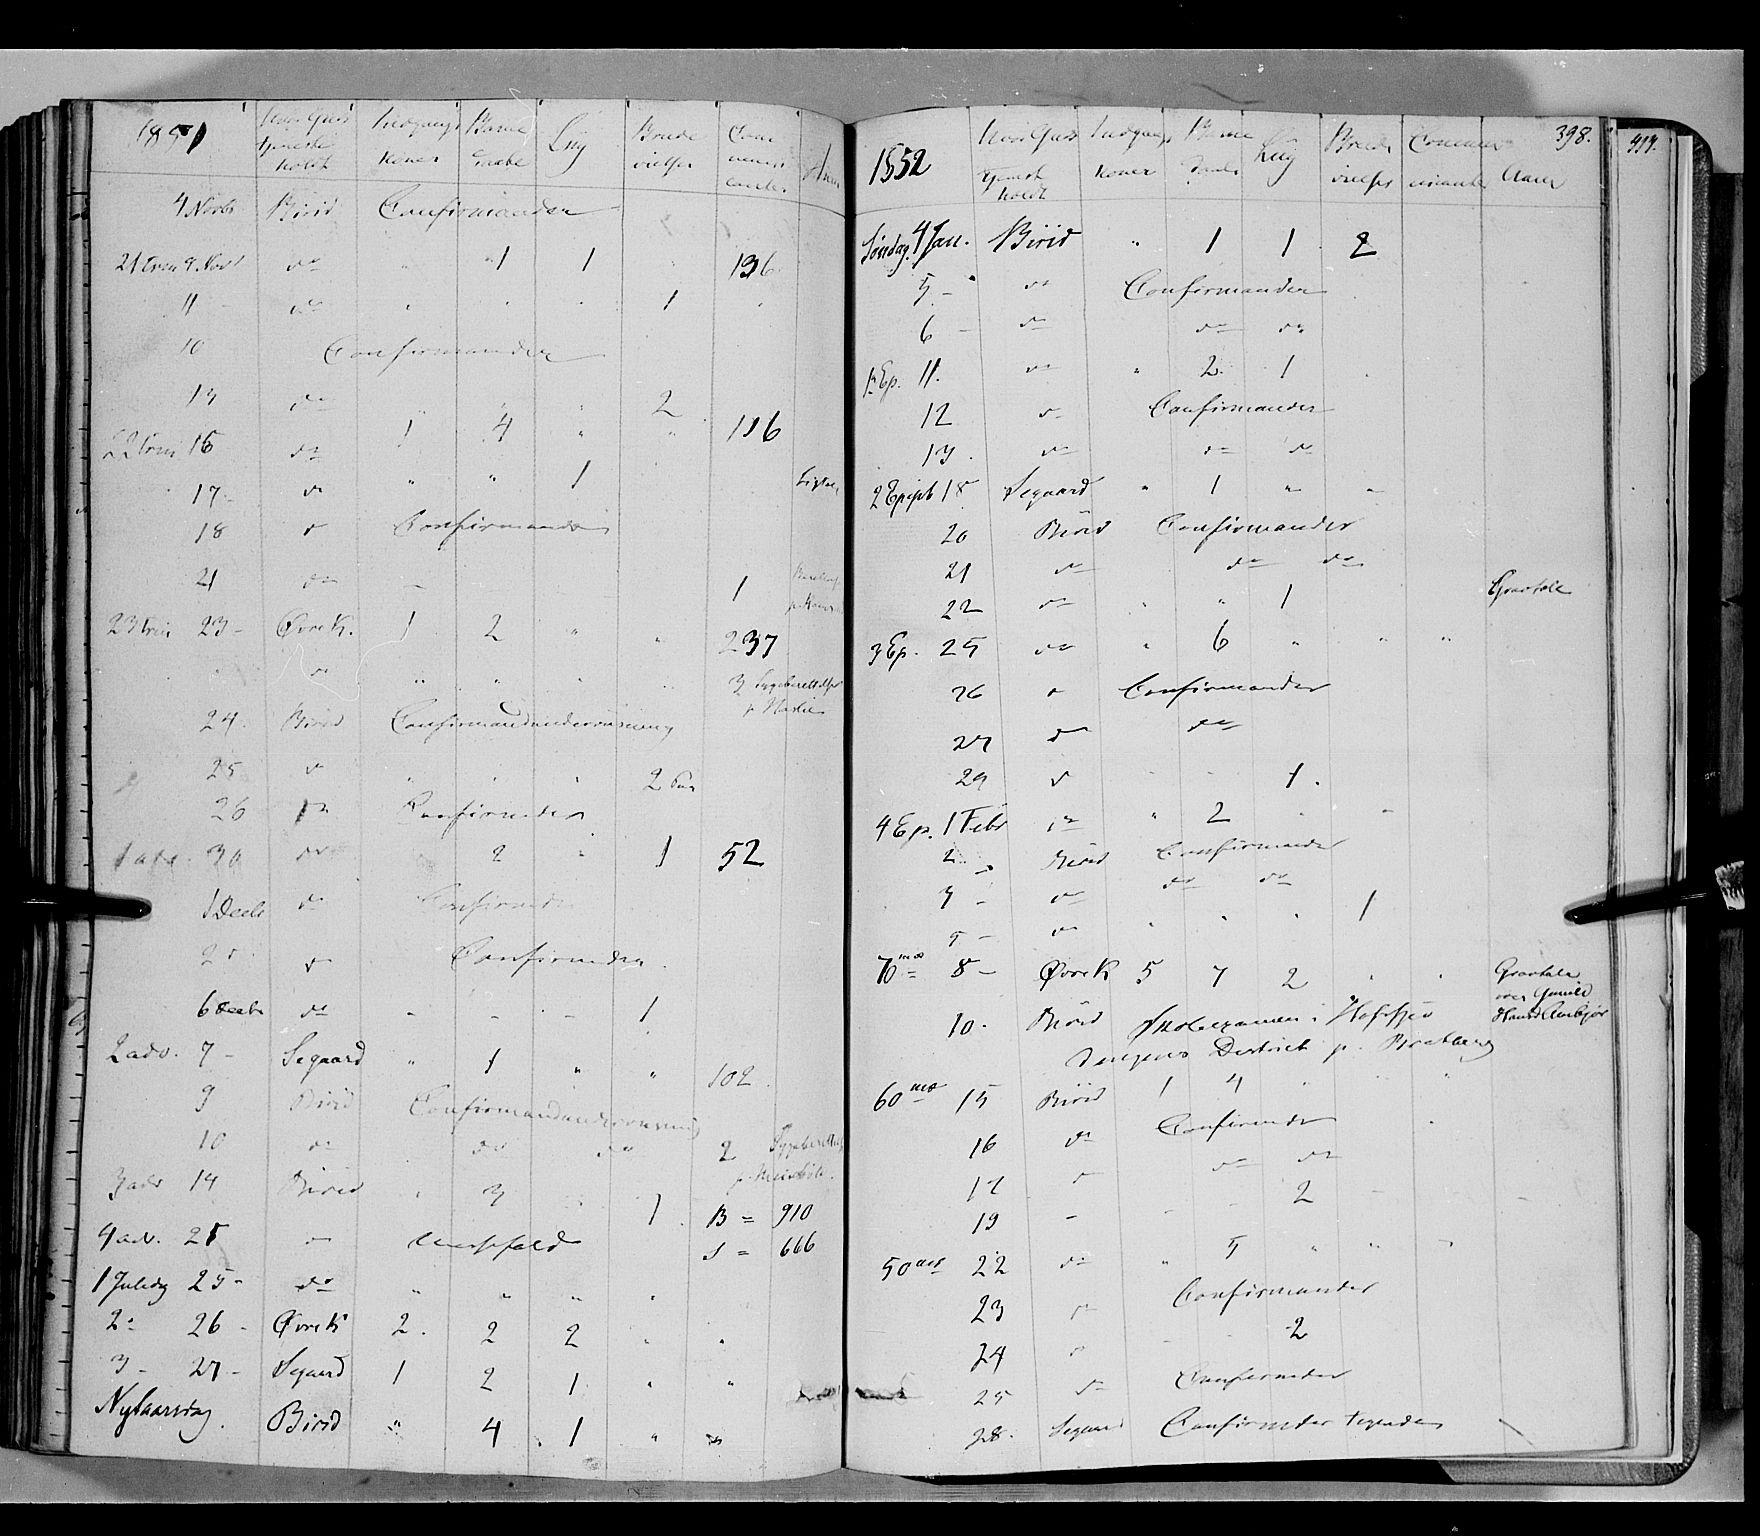 SAH, Biri prestekontor, Ministerialbok nr. 5, 1843-1854, s. 398